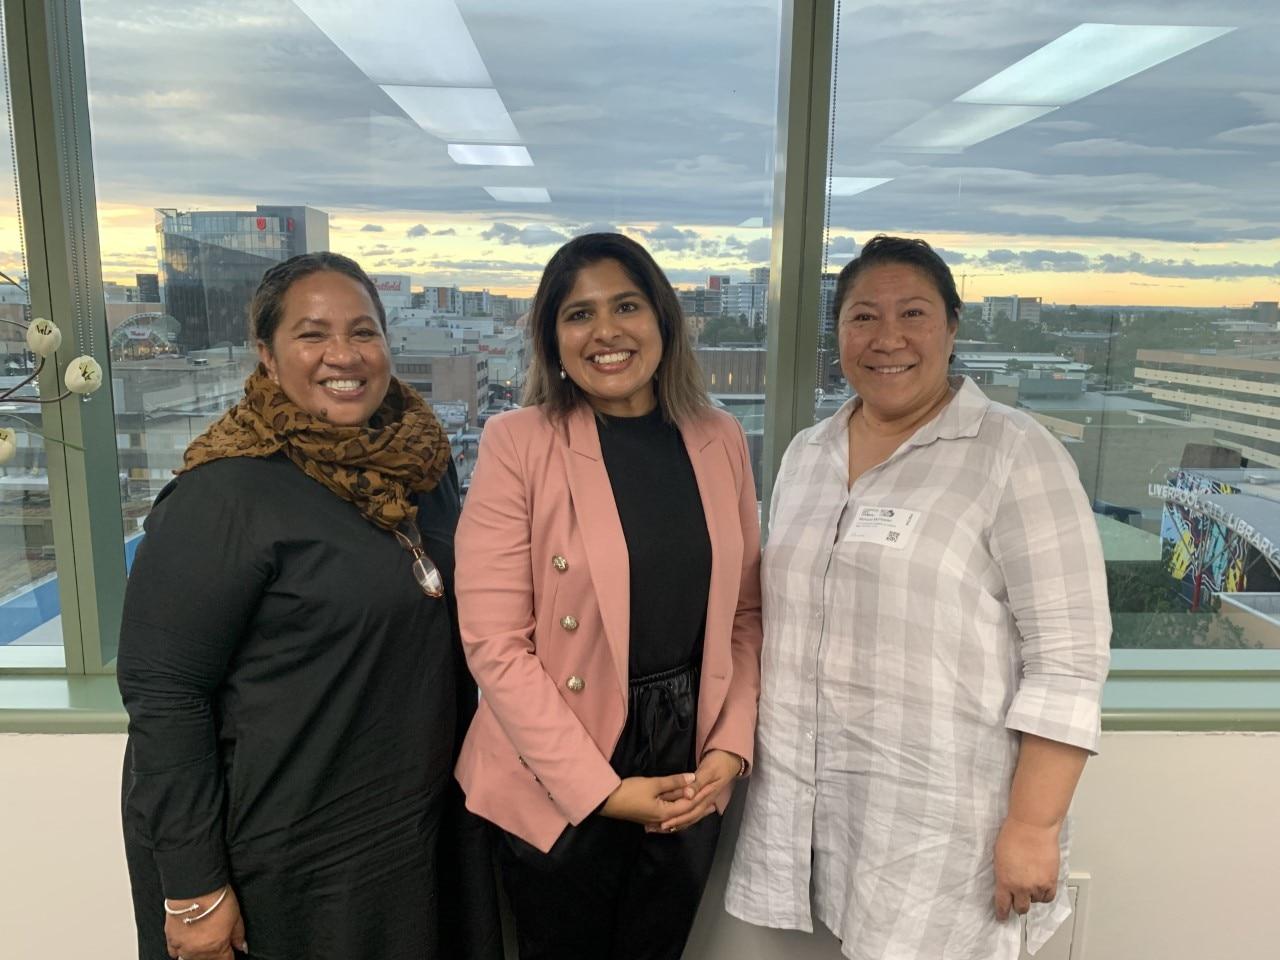 Charishma Kaliyanda (centre) with members of the Fijian Diaspora Women's Alliance in June 2021